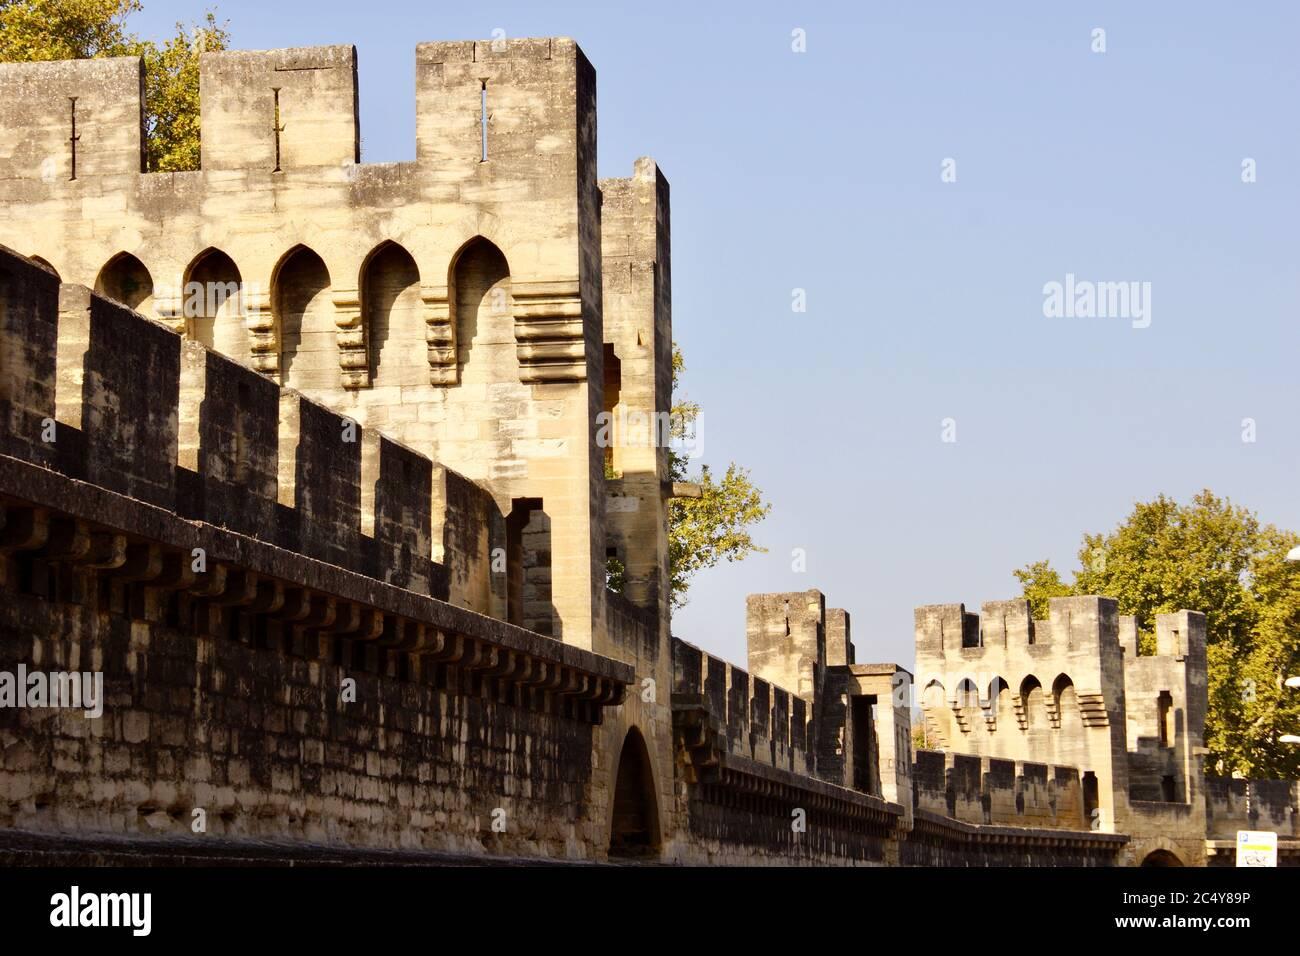 Pont D Avignon Provence Alpes Cote D Azur Papal Residence Papal Gardens Unesco World Heritage Town Medieval History Historic Stock Photo Alamy